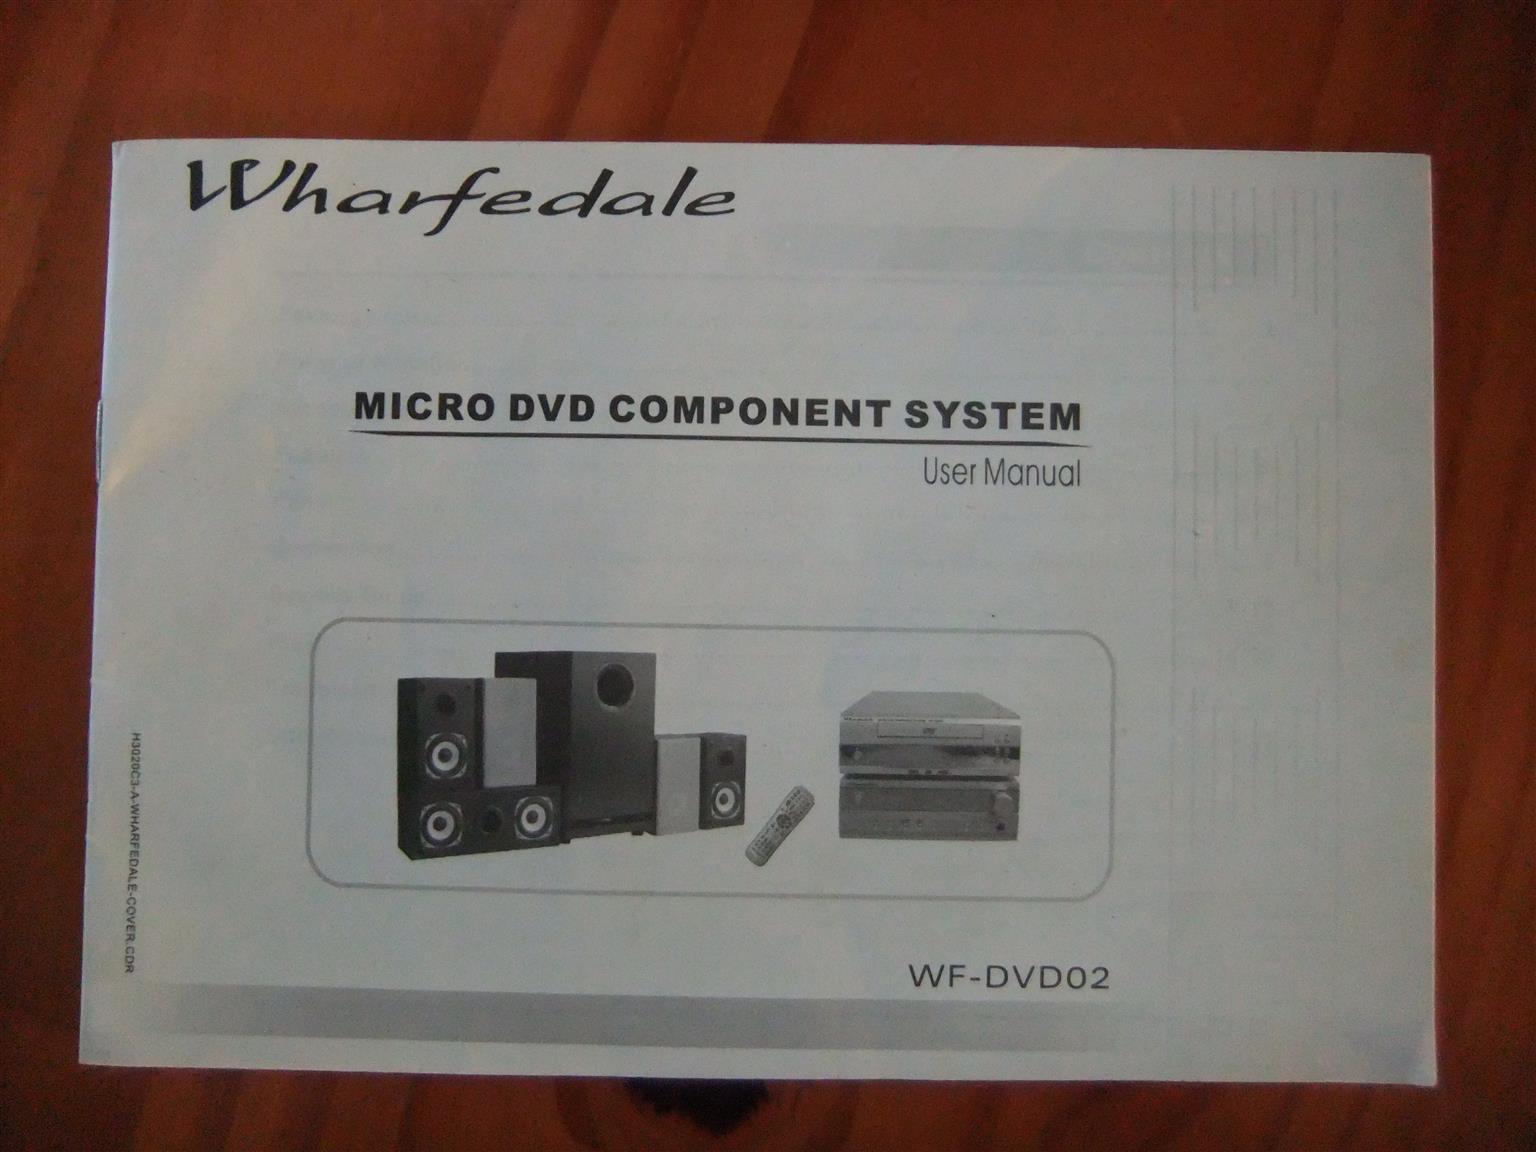 Micro DVD Component Set (6 Speakers surround sound)